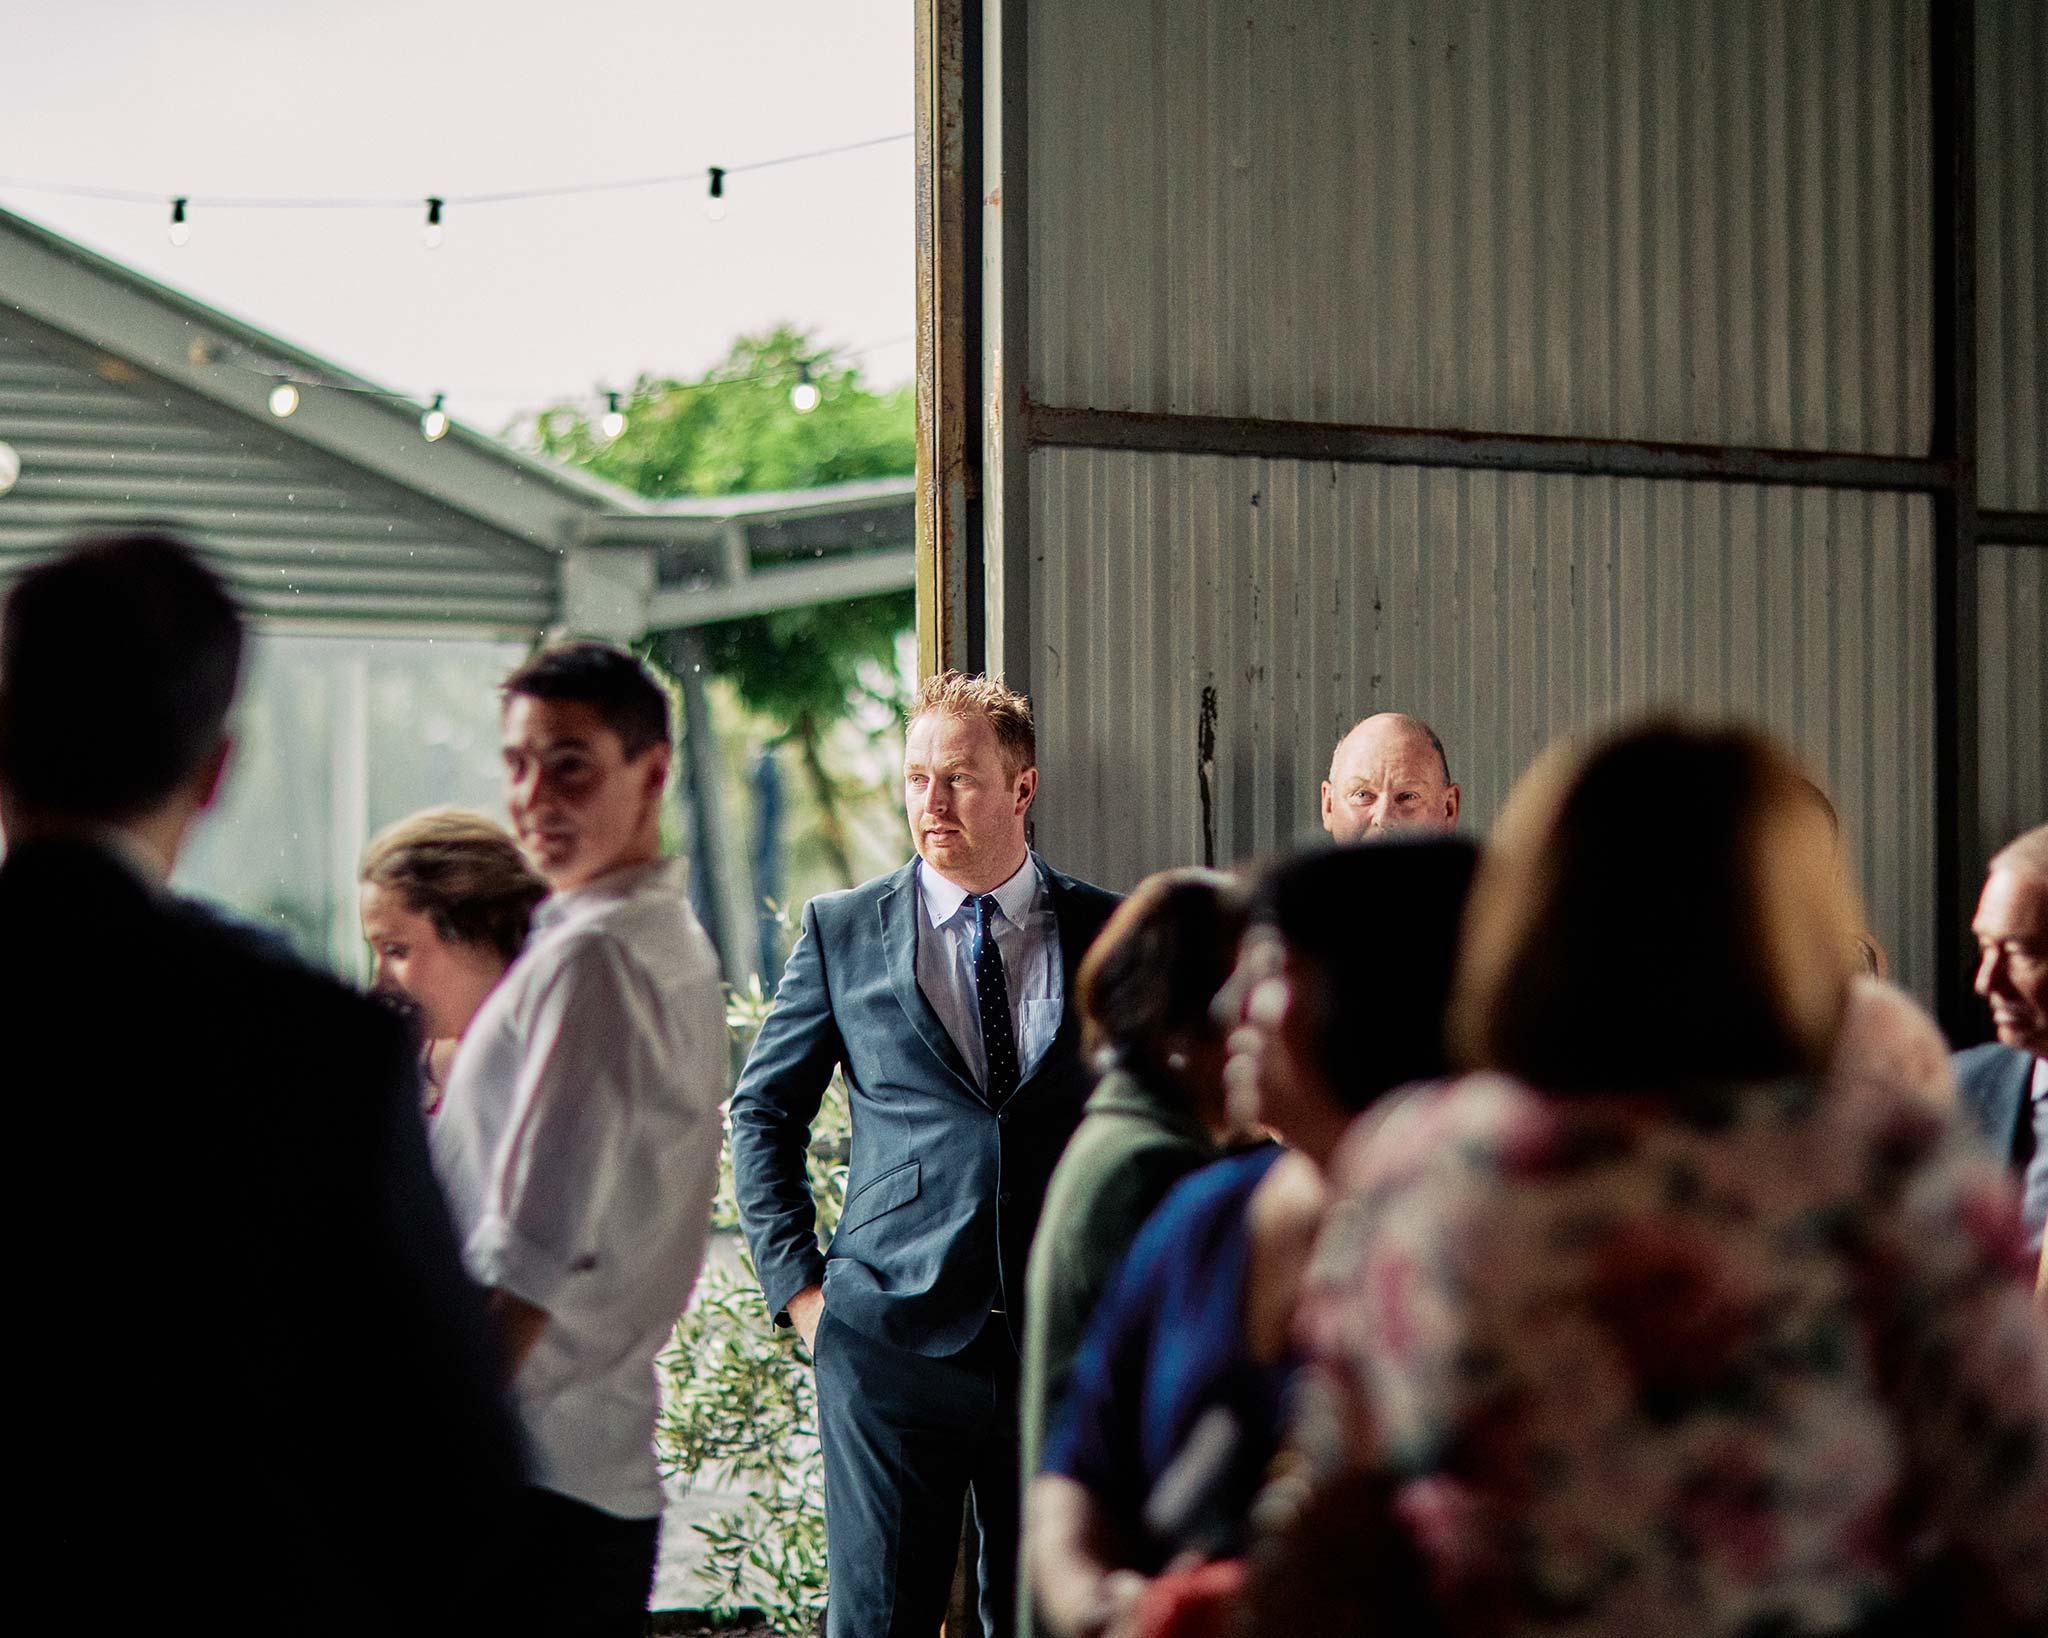 Zonzo estate wedding guests chatting